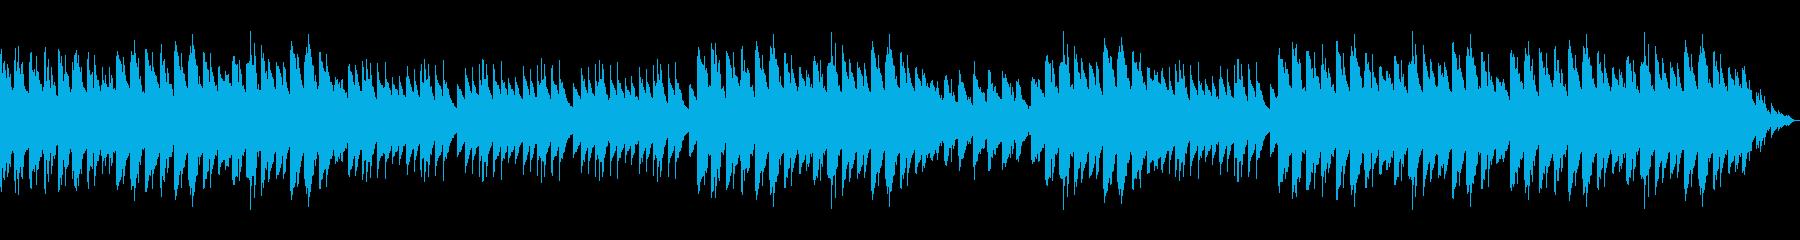 LoFi・ヒップホップ・ギター・Vlogの再生済みの波形